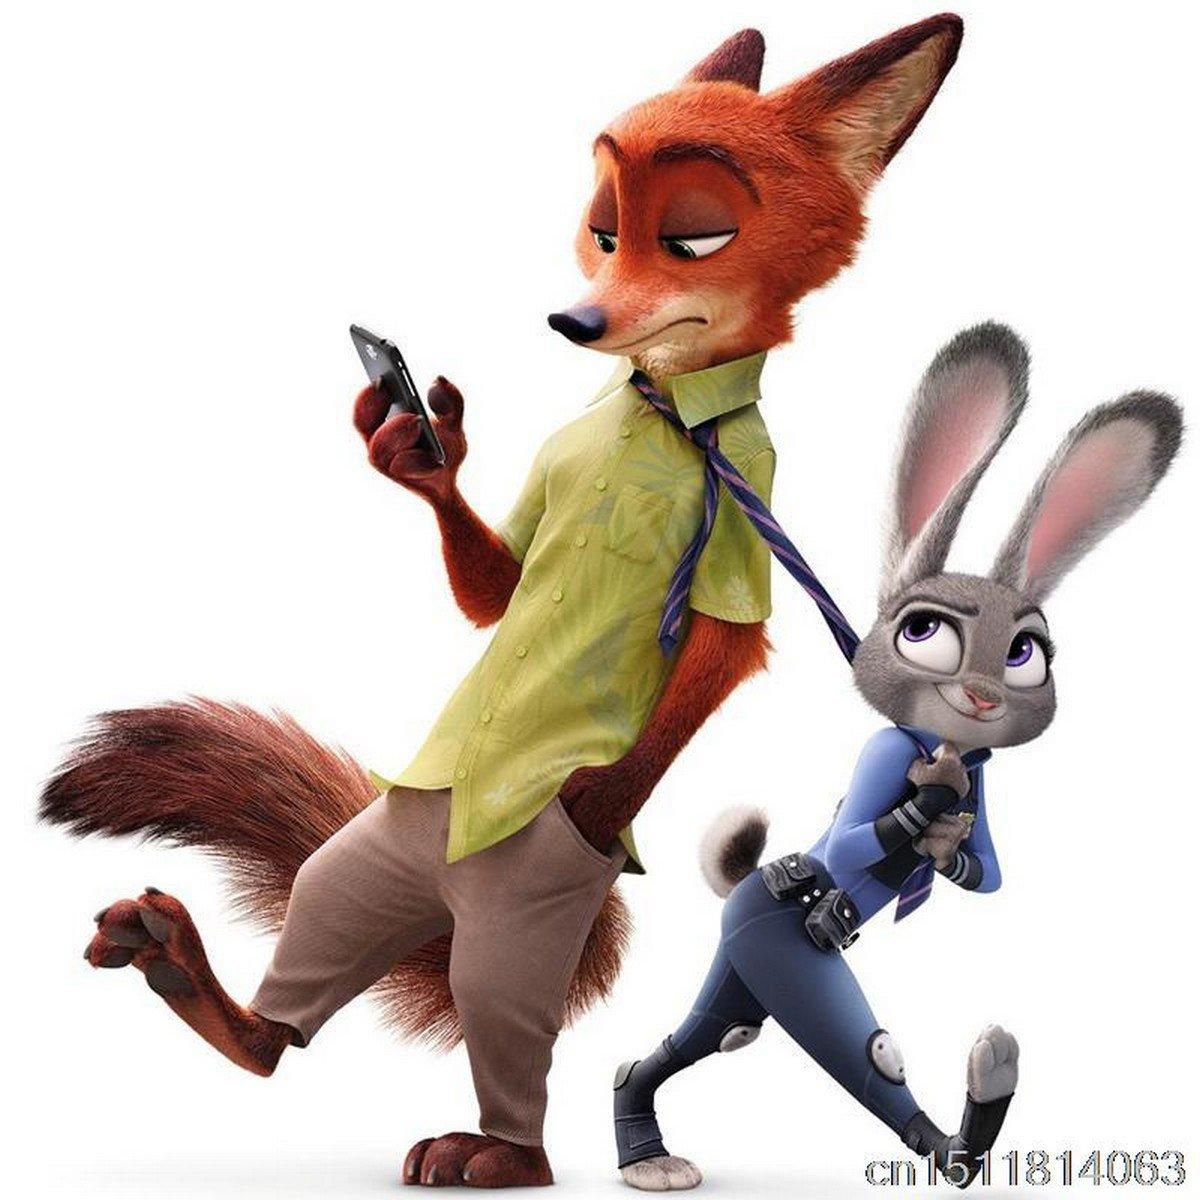 Buy 35CM Anime Zootopia Plush Rabbit JUDY Hopps Fox Nick Wild Toys For Baby Kids Dolls from Reliabl